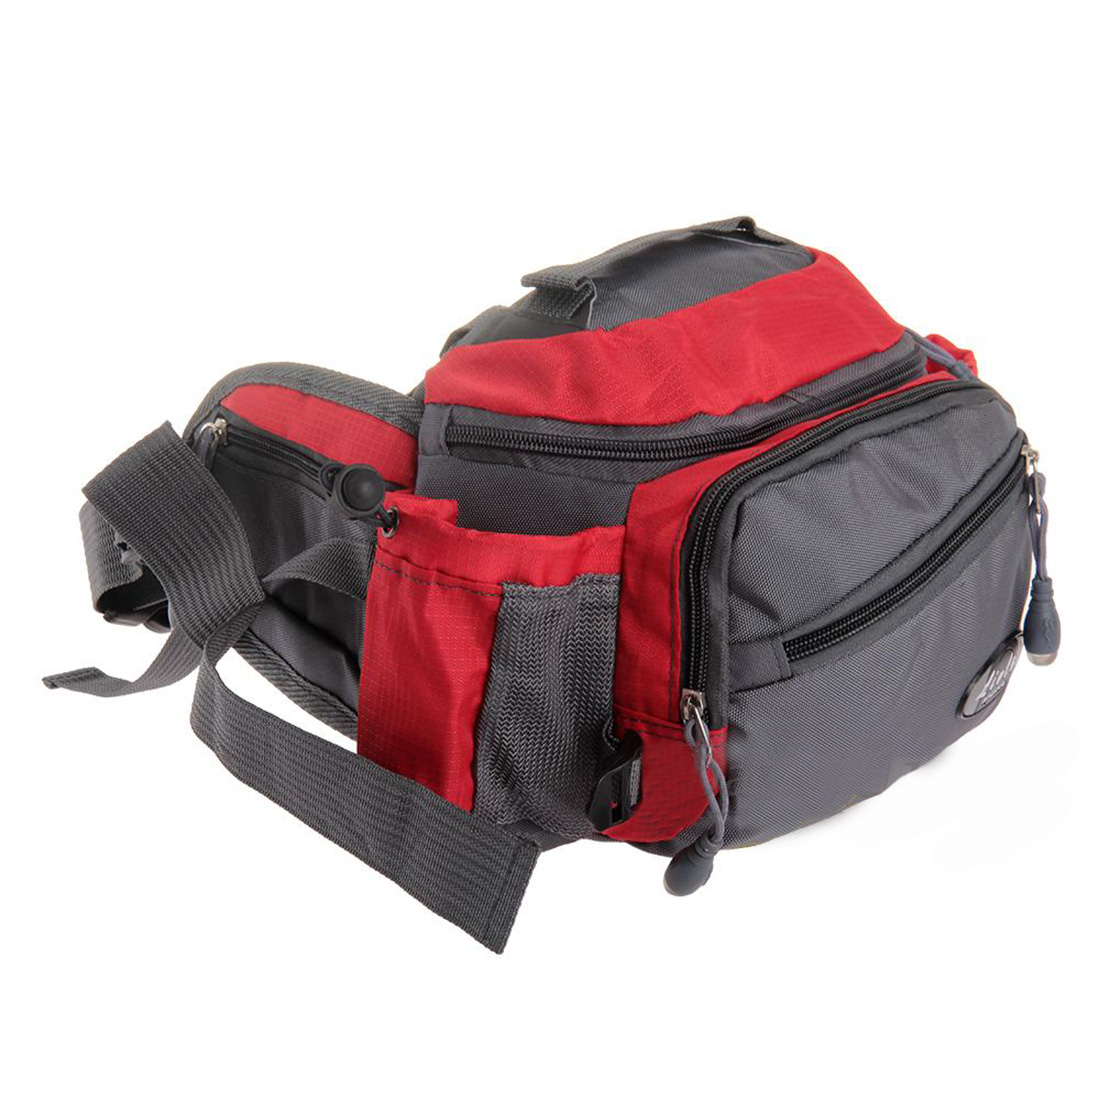 High Quality Portable Waist Bag Fanny Pack Shoulder Crossbody Multifunction Nylon Red + Grey(China (Mainland))